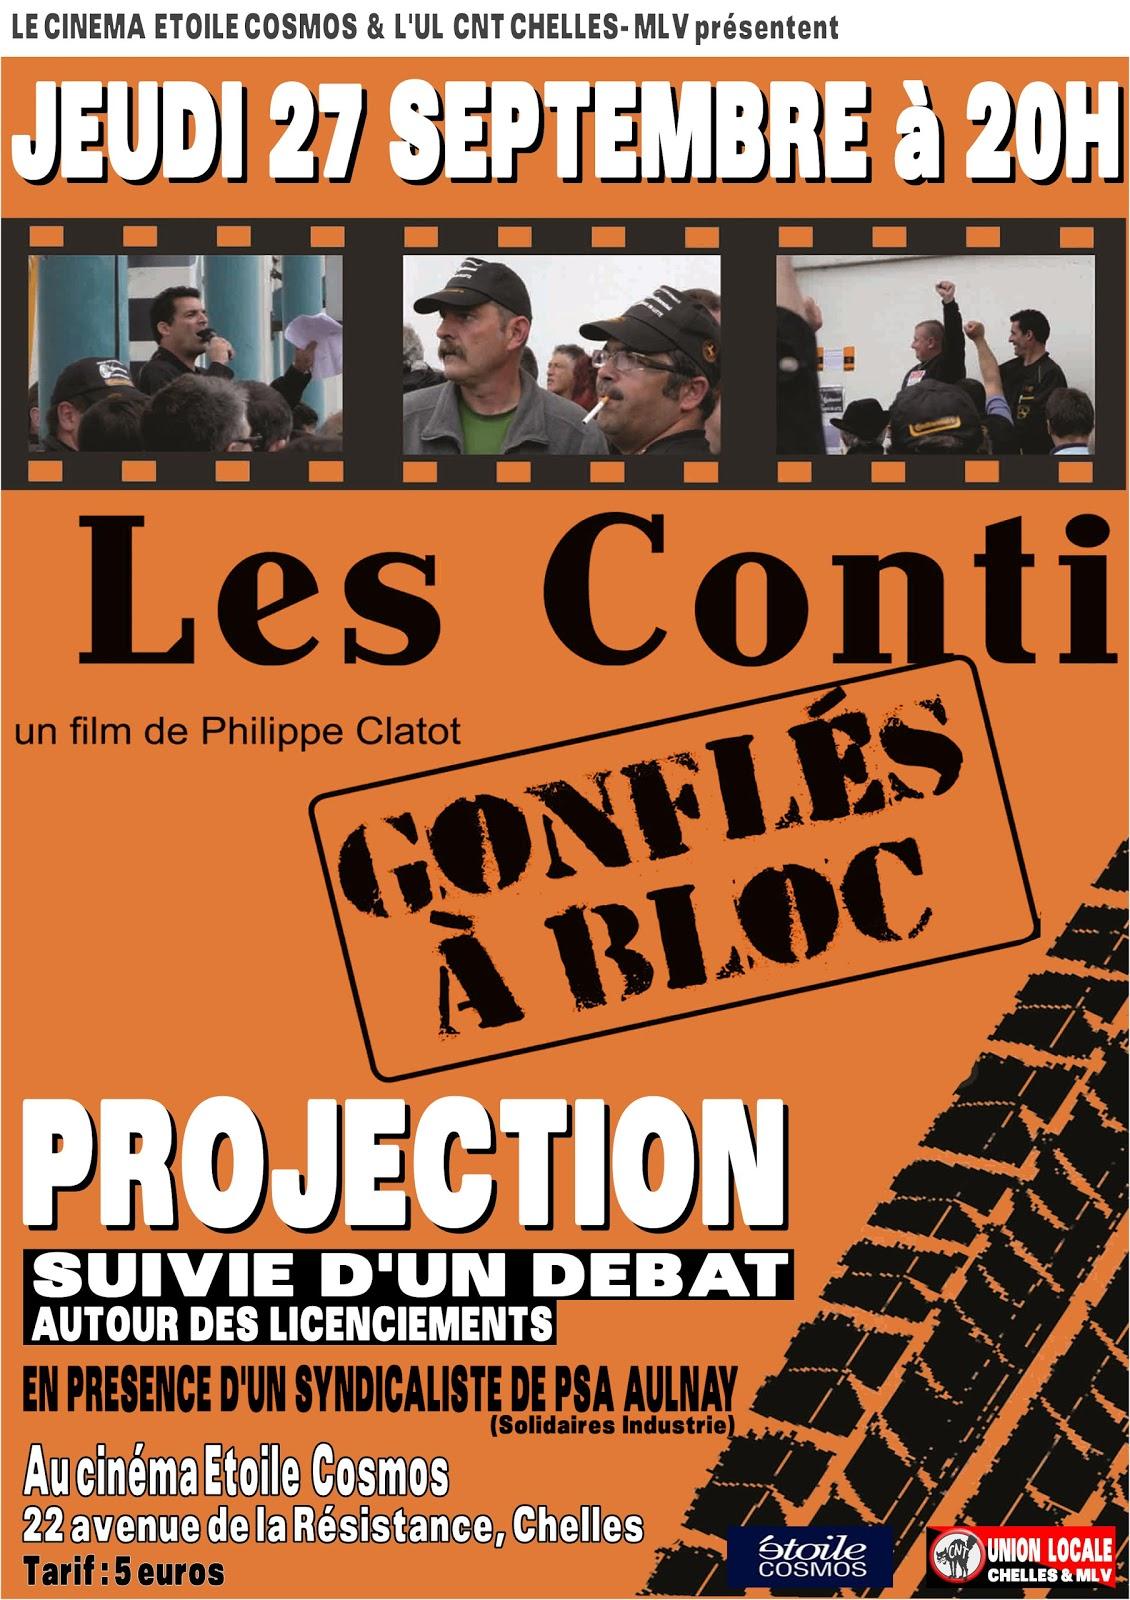 union locale cnt chelles marne la vall 233 e ul cnt chelles mlv projection debat les